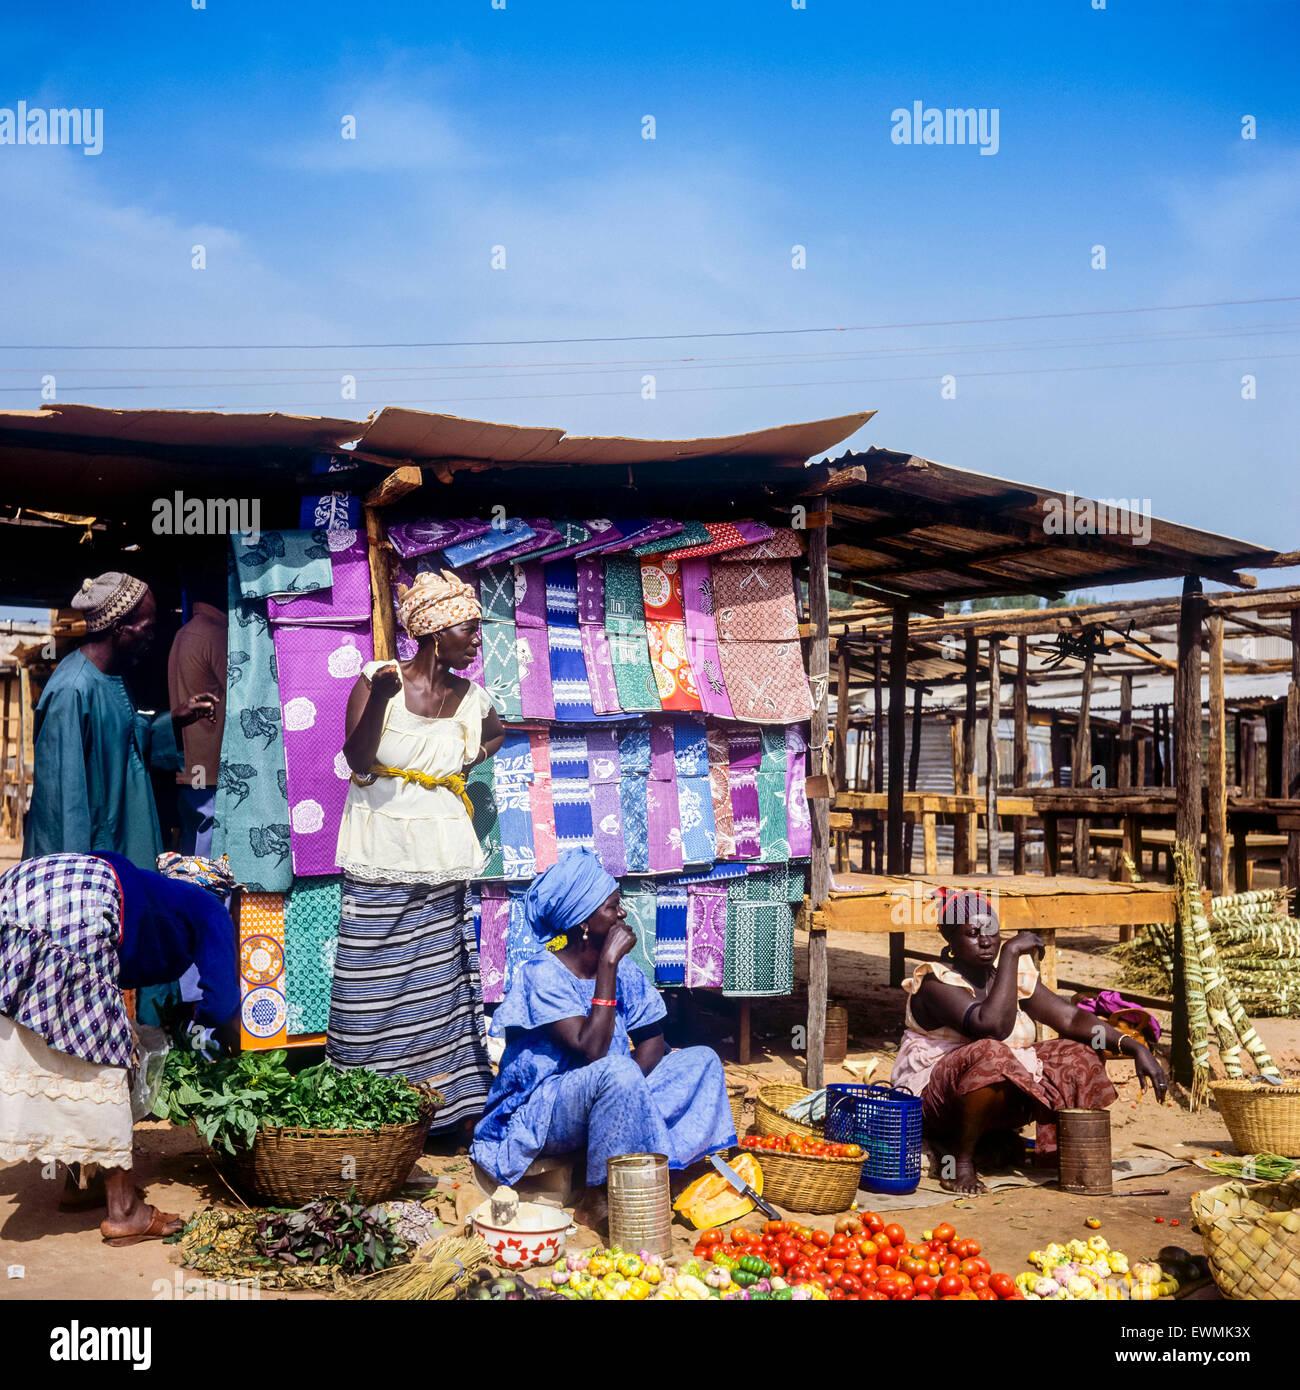 Vegetable and household linen merchants, Albert market, Banjul, Gambia, West Africa - Stock Image